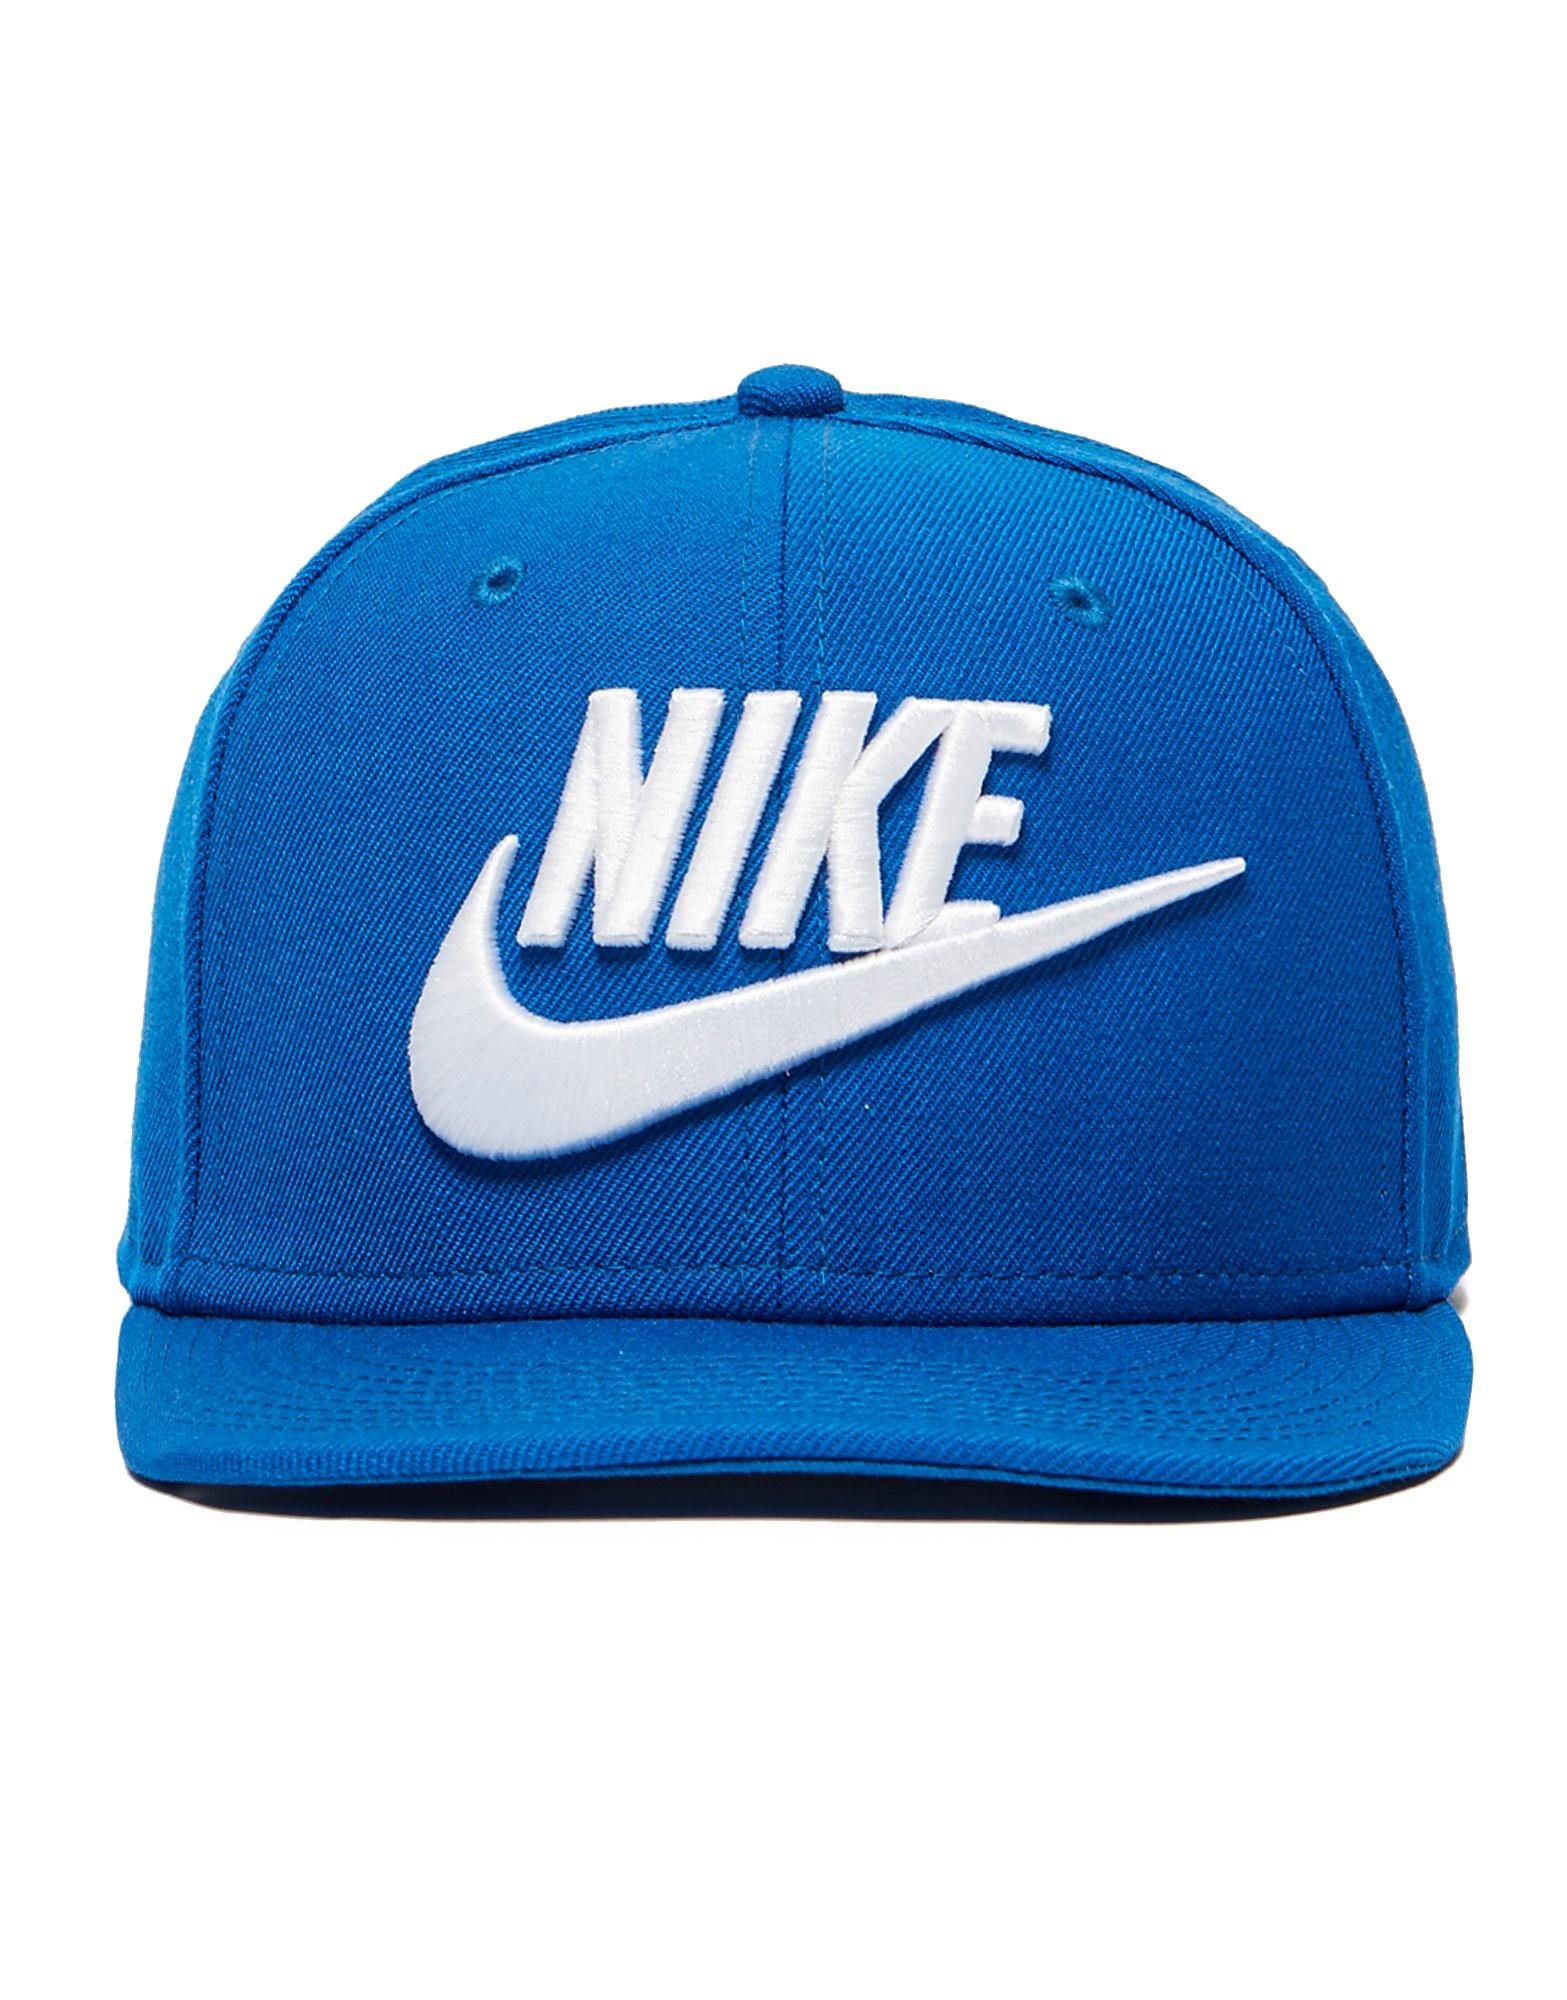 Nike gorra Futura True 2 Snapback